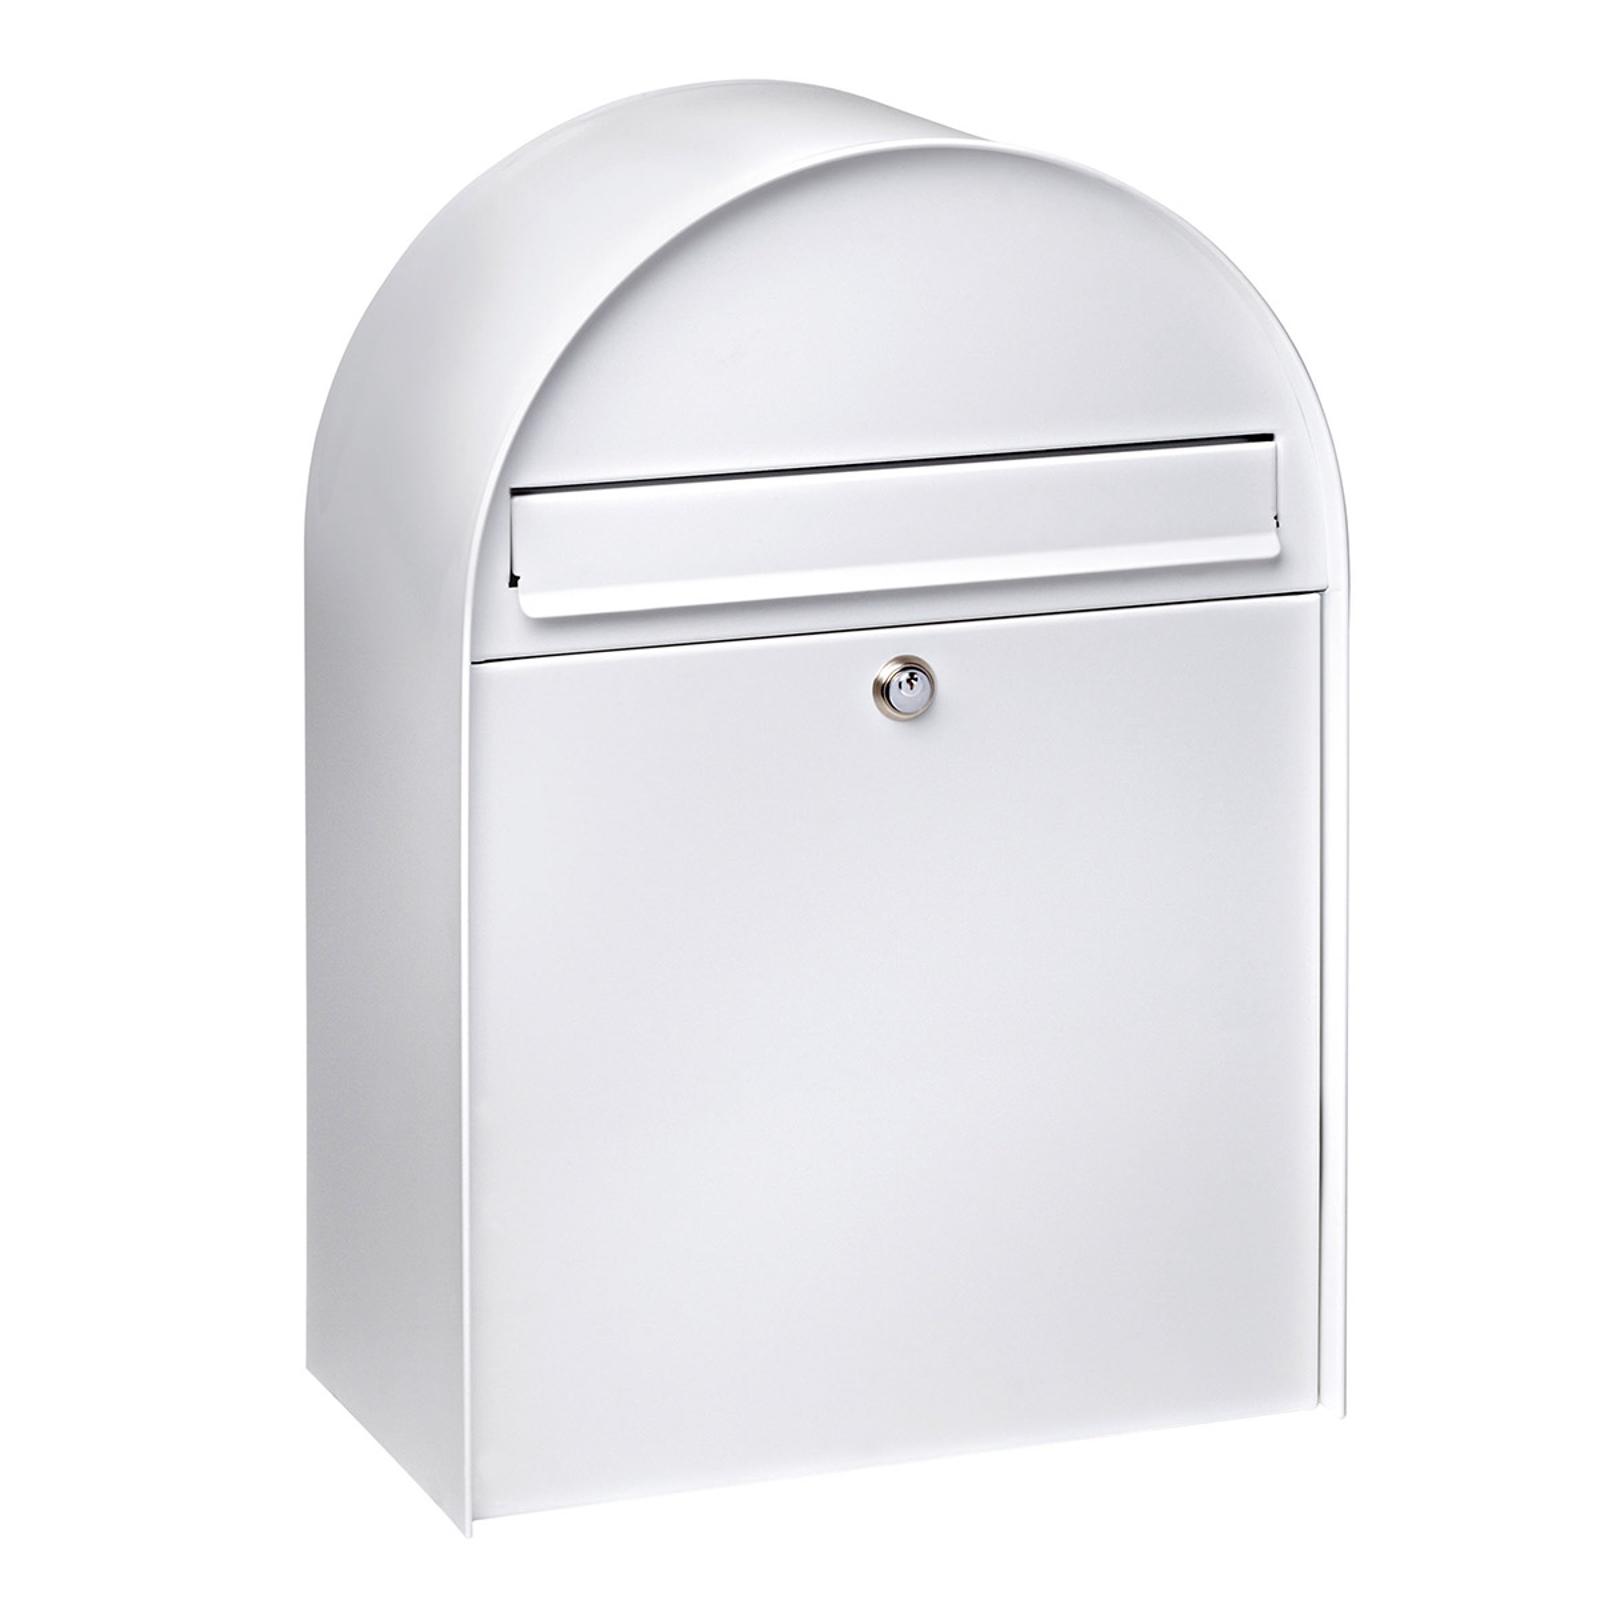 Nordic 780 - grossa cassetta postale, bianco